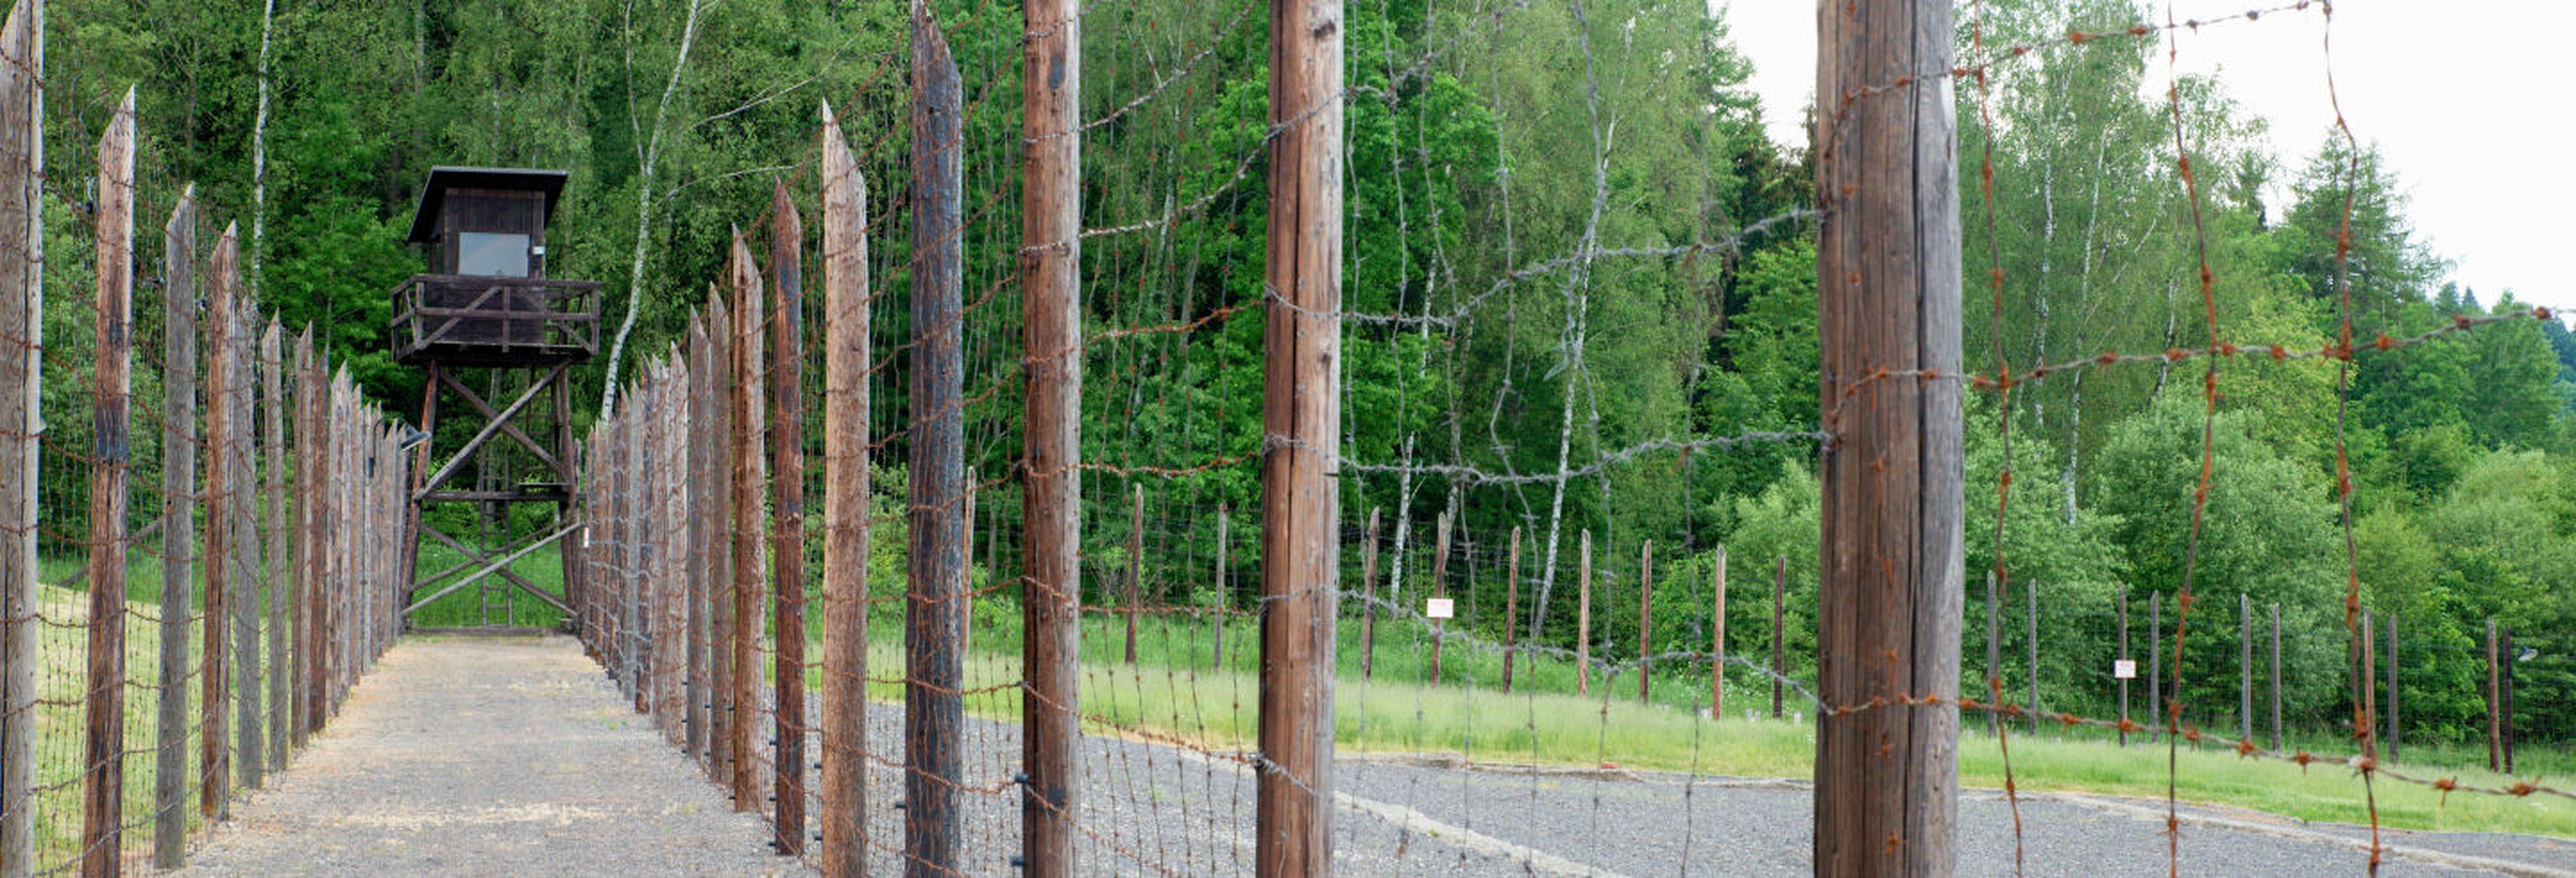 Excursión al gulag checo Vojna Memorial